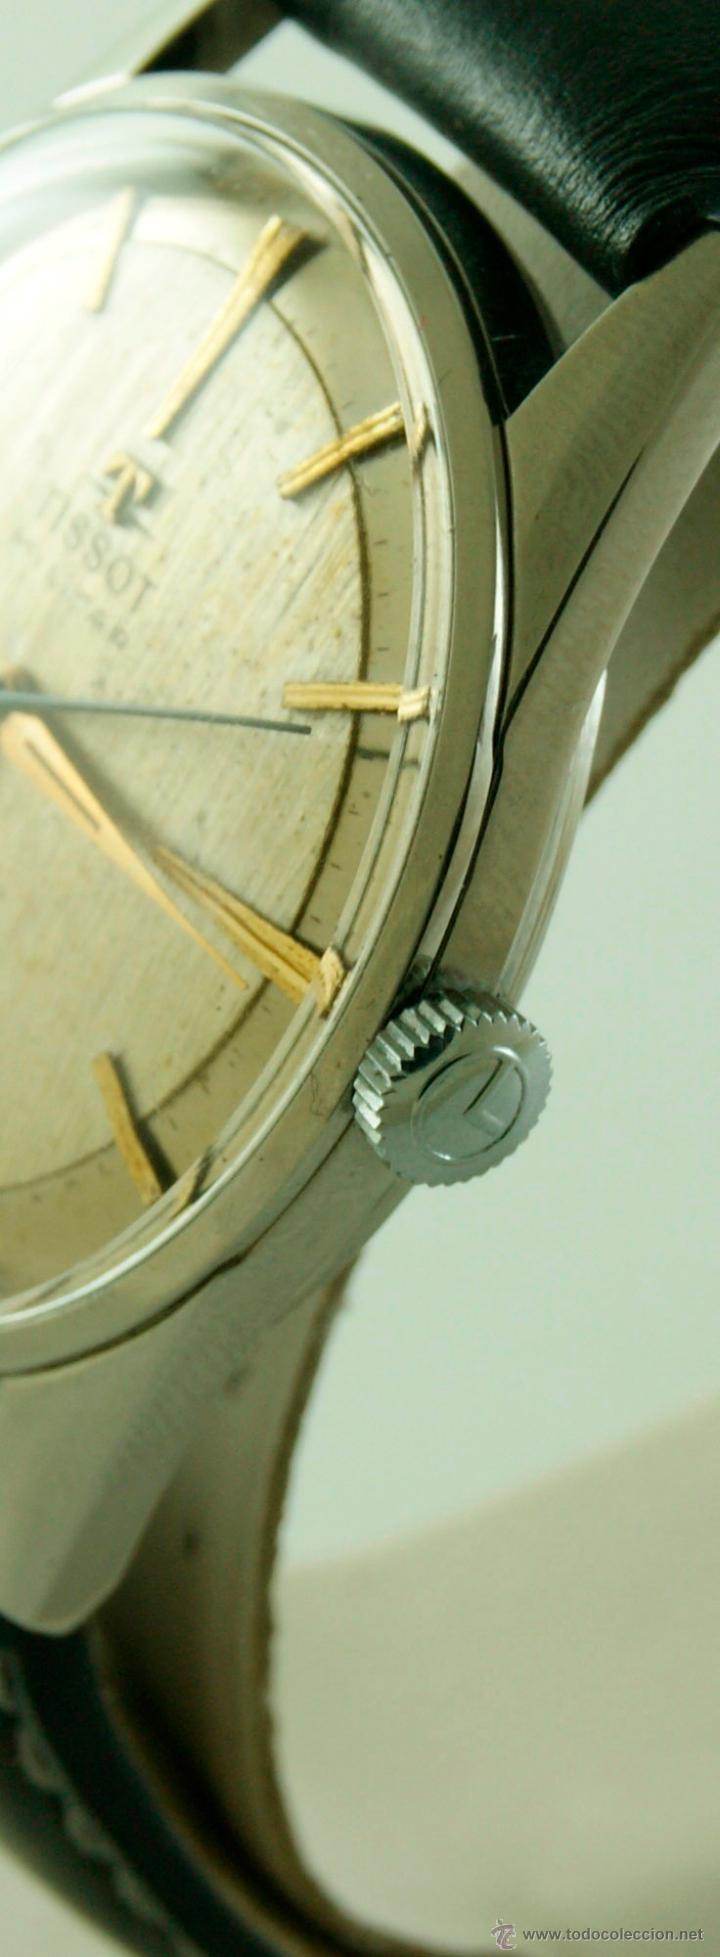 Relojes - Tissot: MUY RARO TISSOT MILITAR CALIBRE 781 MECANICO - Foto 3 - 53732770